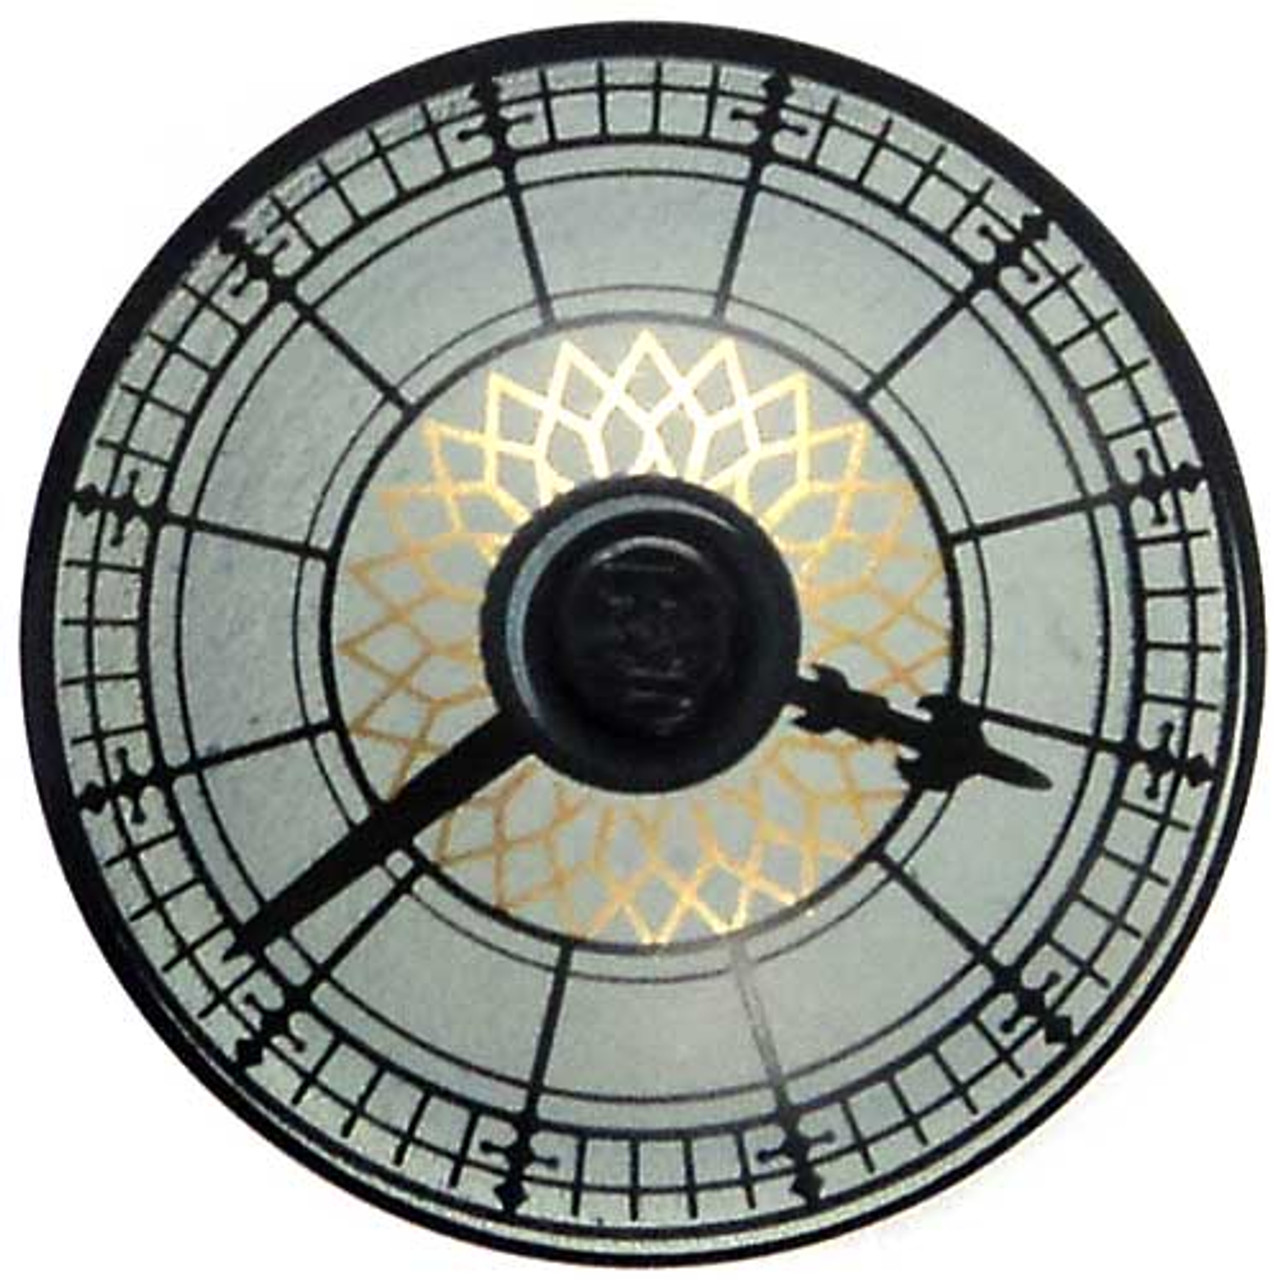 LEGO City Black Dish 4 x4 Town Hall Clock [Loose]